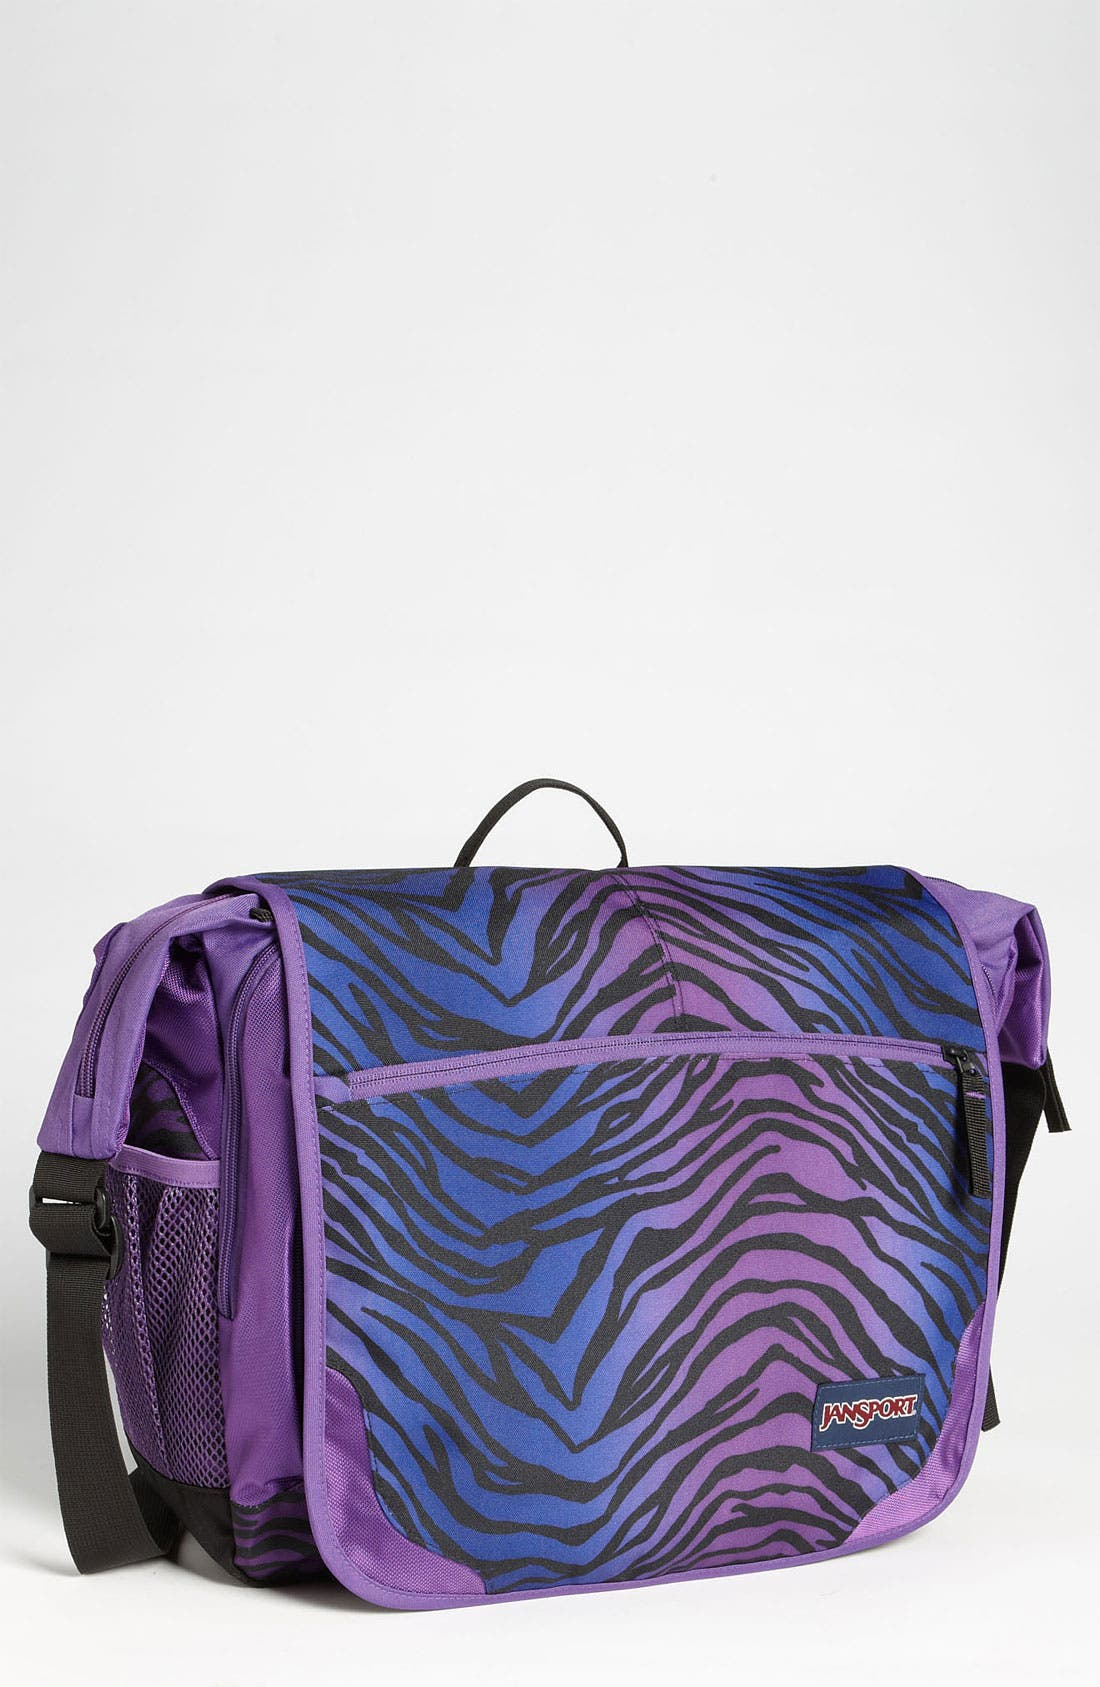 Main Image - Jansport 'Elephunk' Computer Crossbody Bag (15 inch) (Girls)